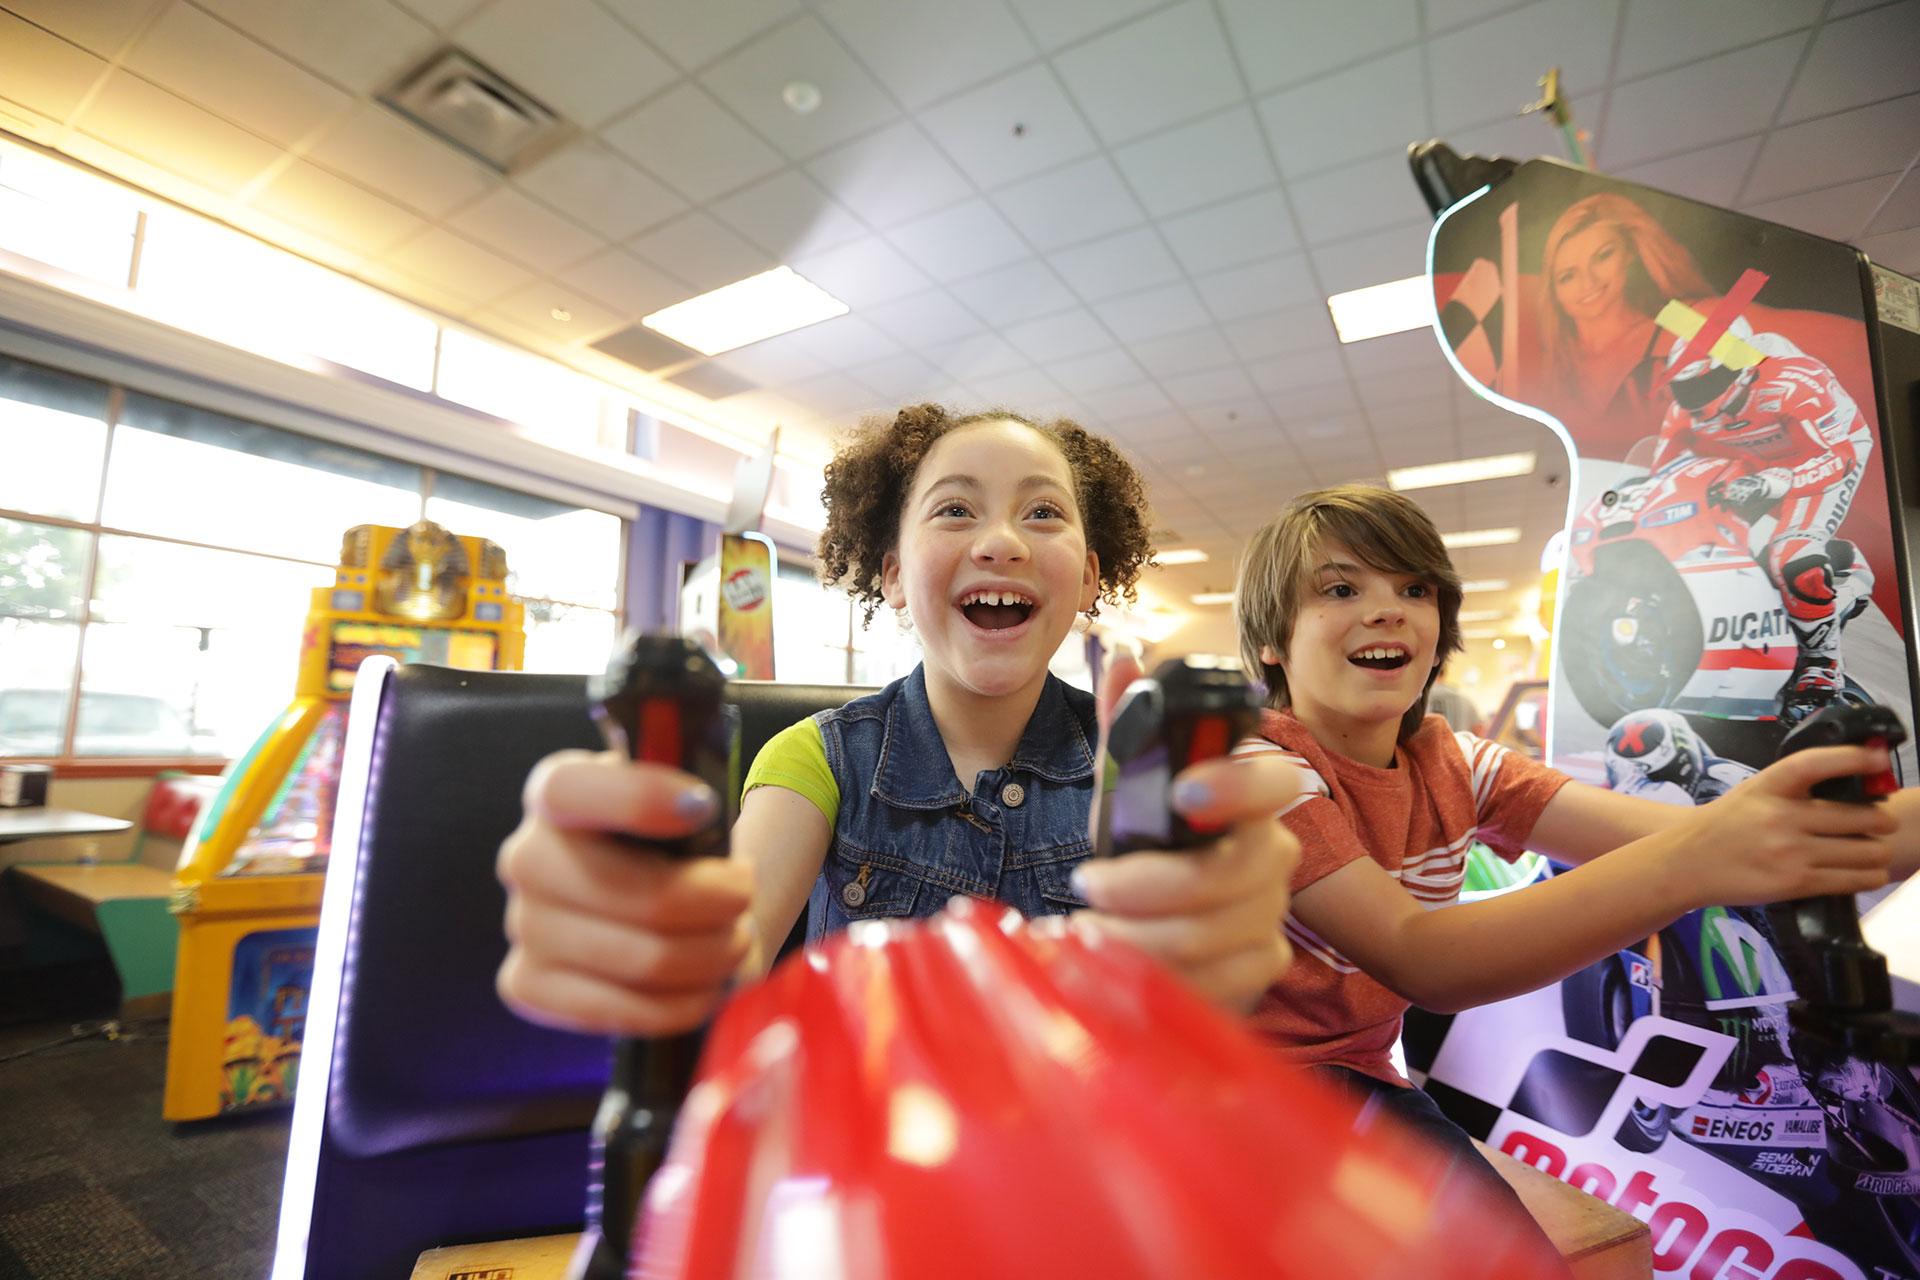 Two kids playing arcade game